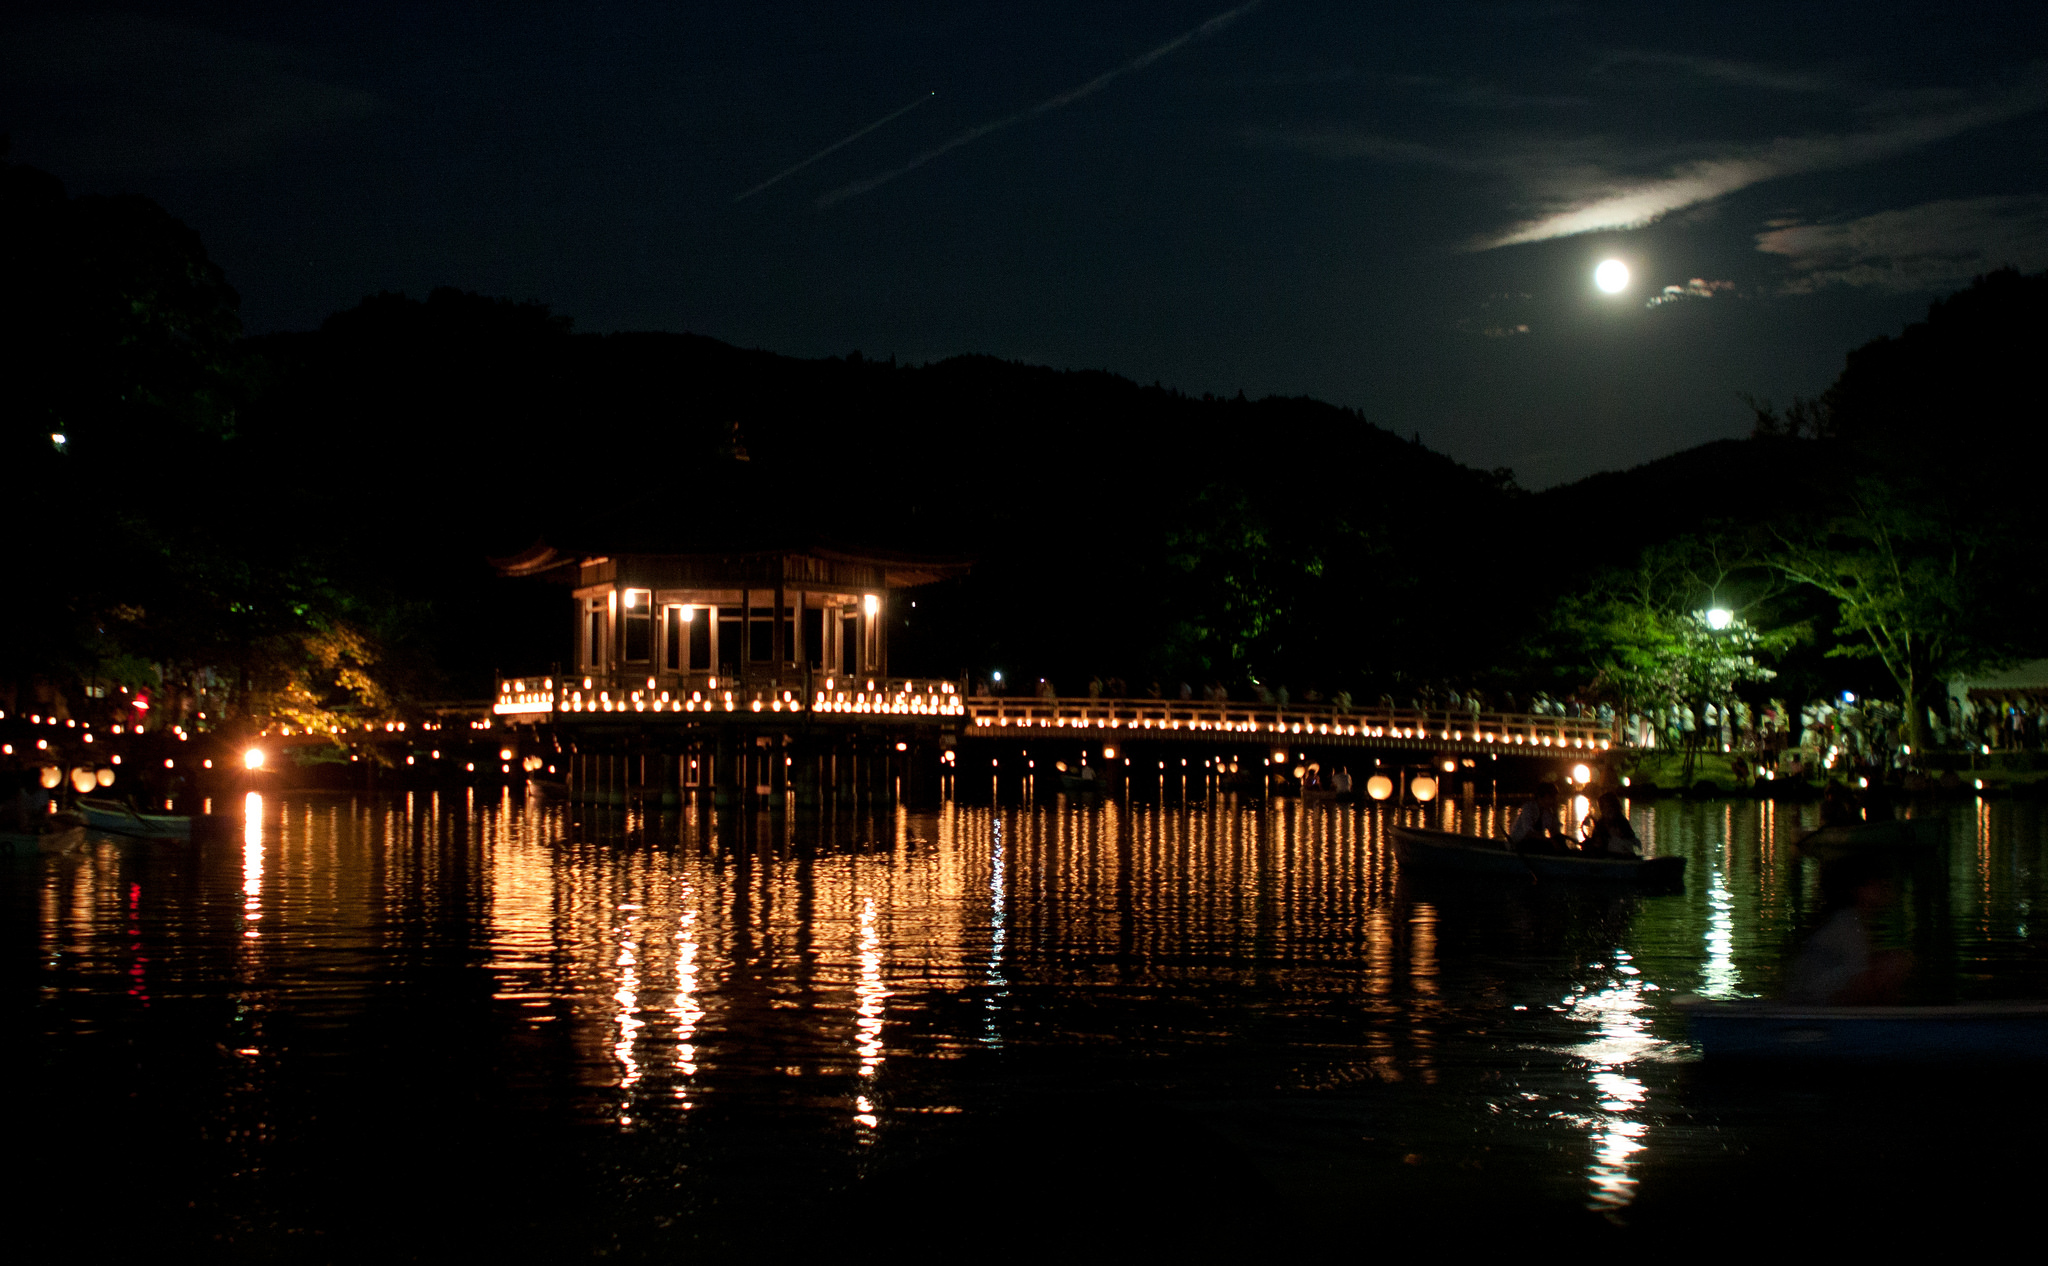 Nara Night